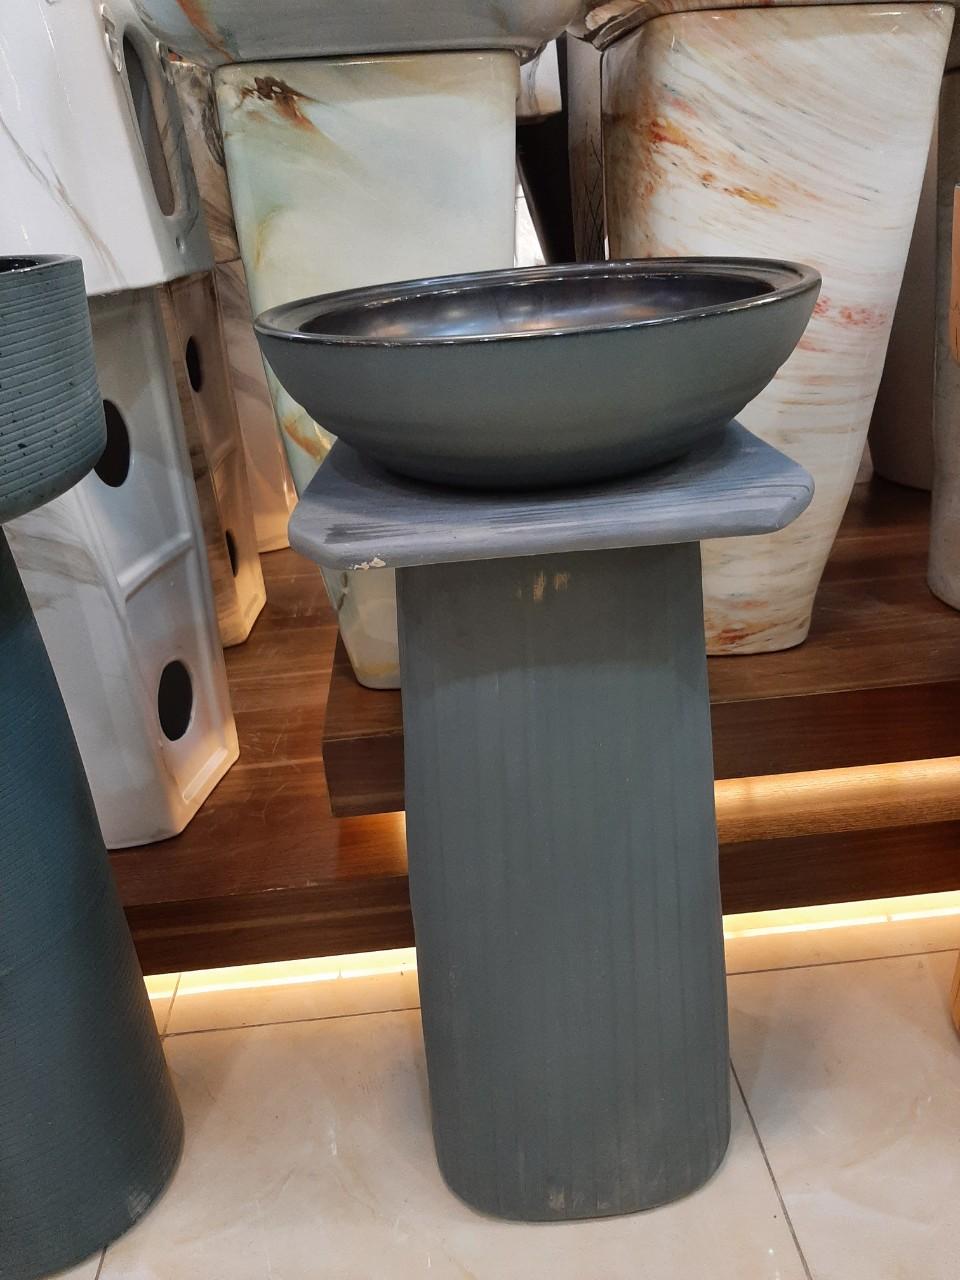 lavabo-dung-xanh-xam-21089